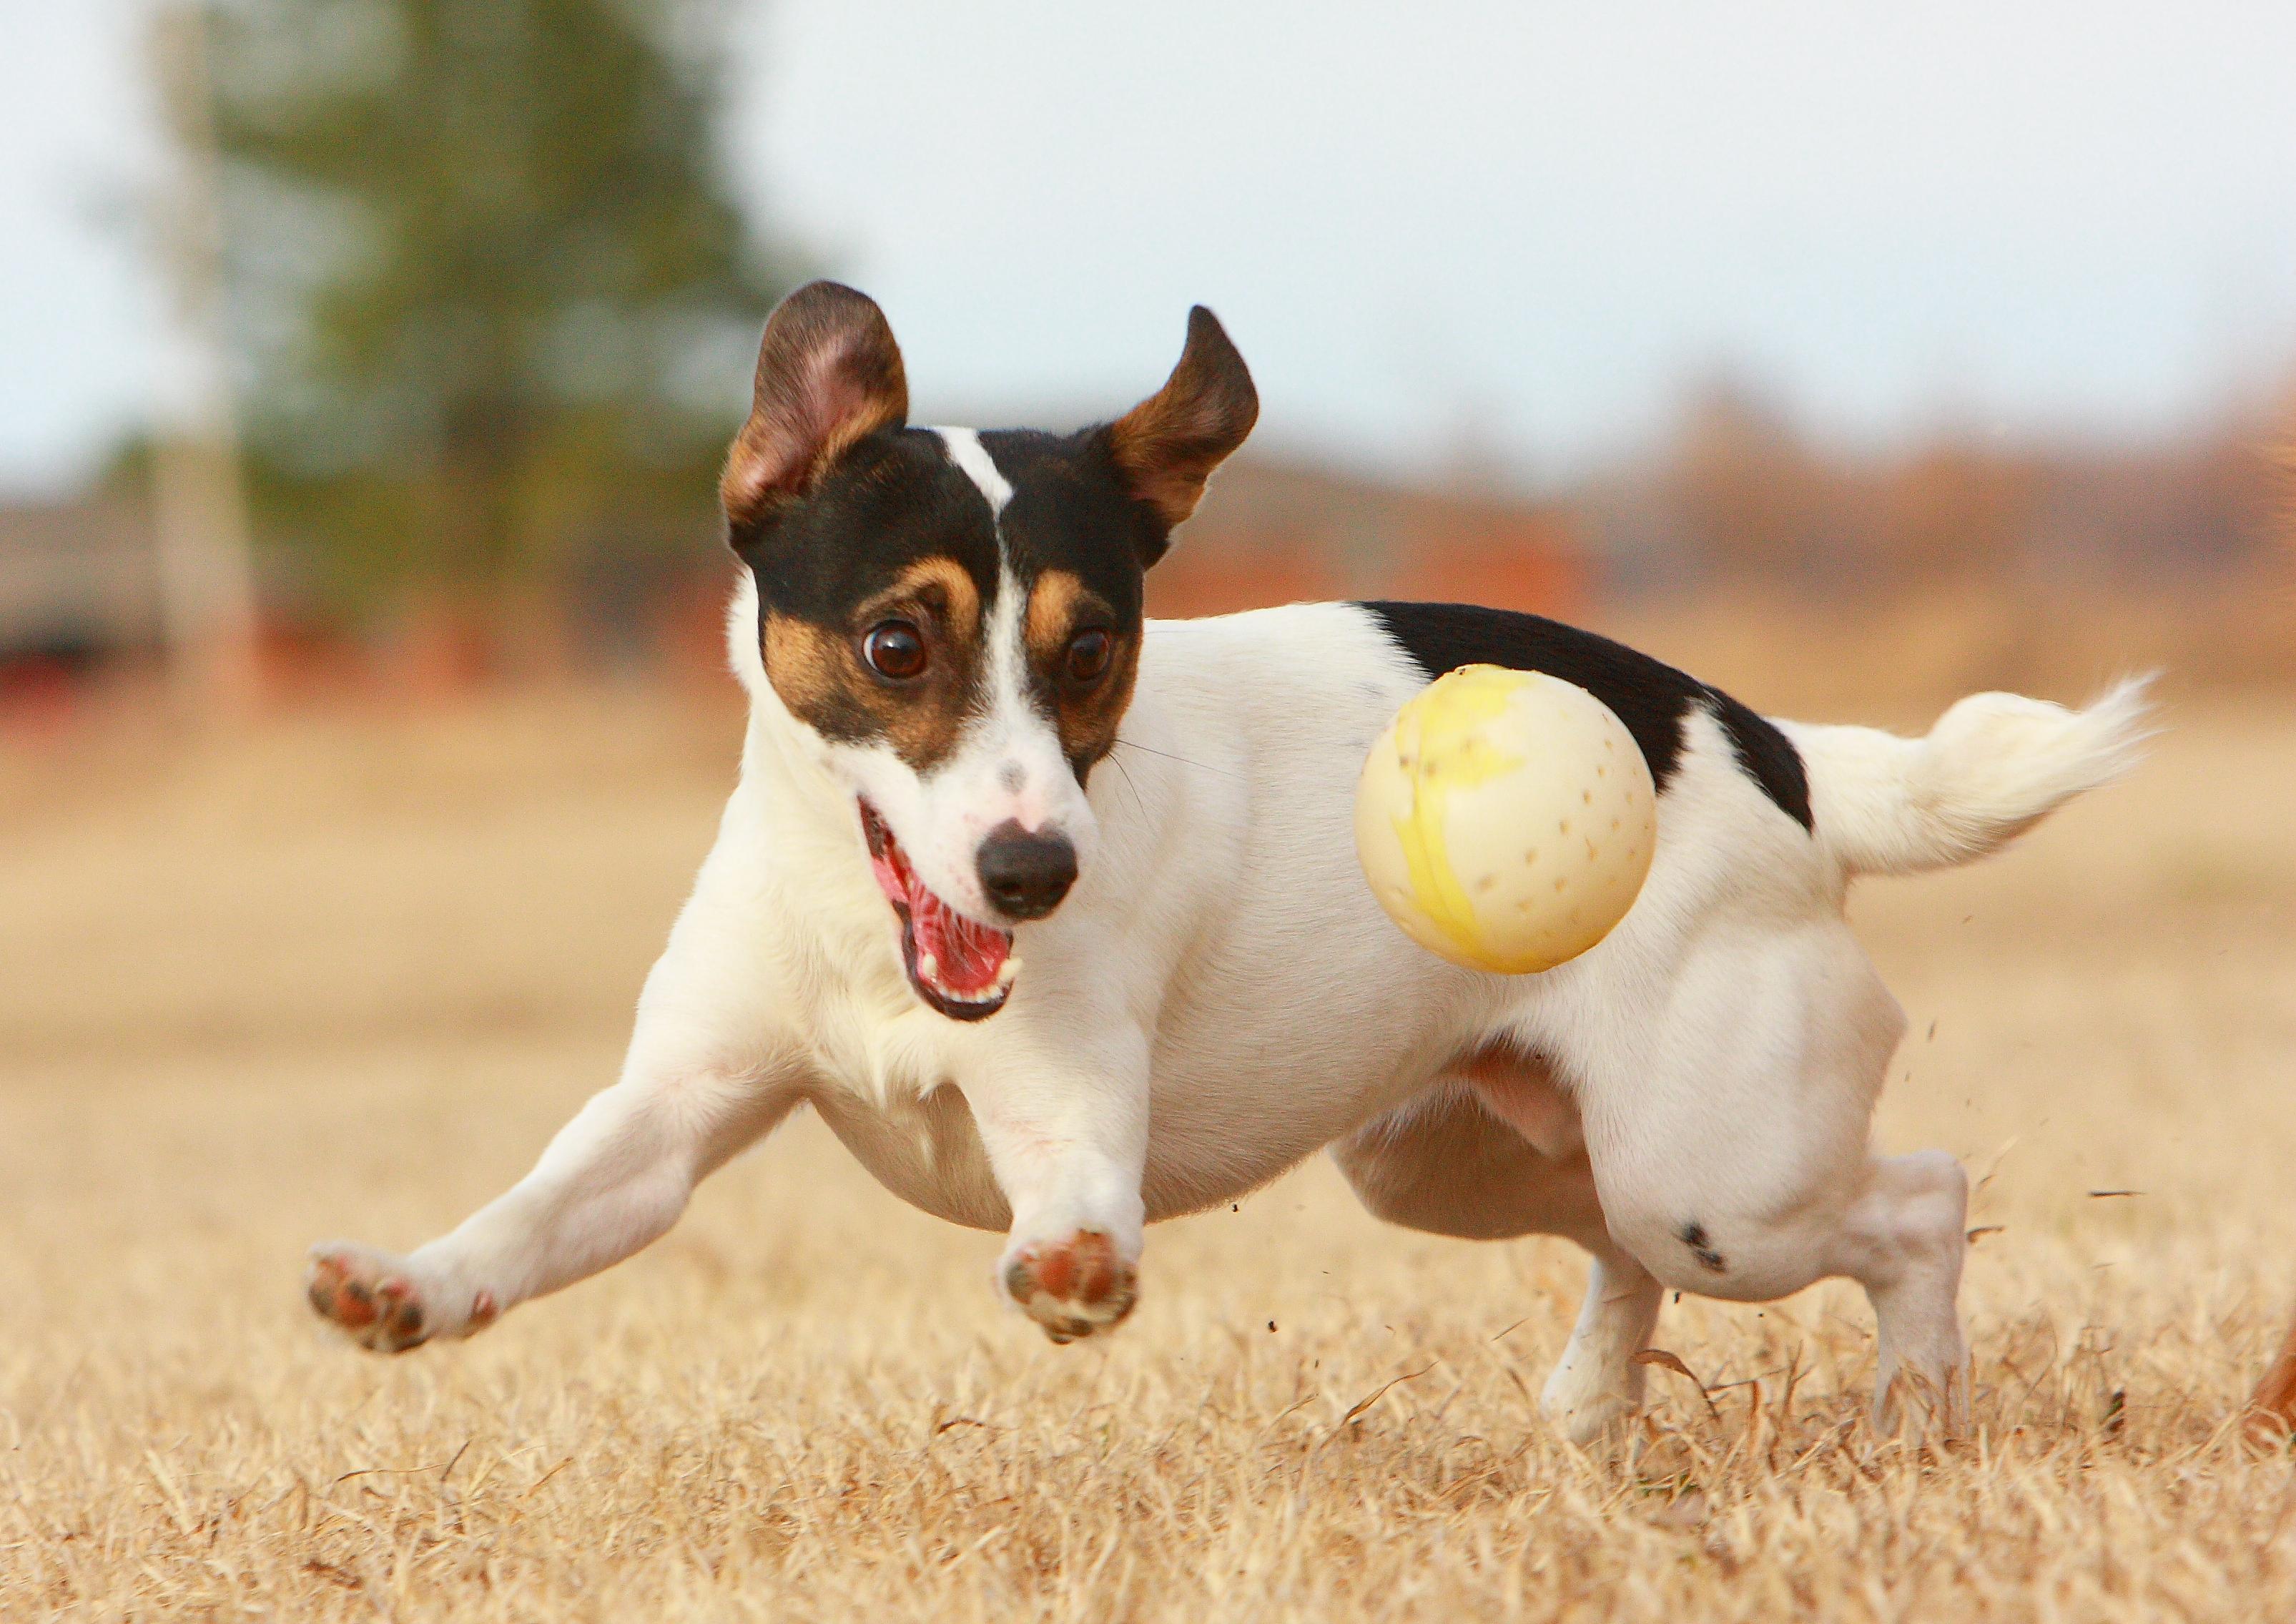 Un jack russel terrier essaie d attraper une balle